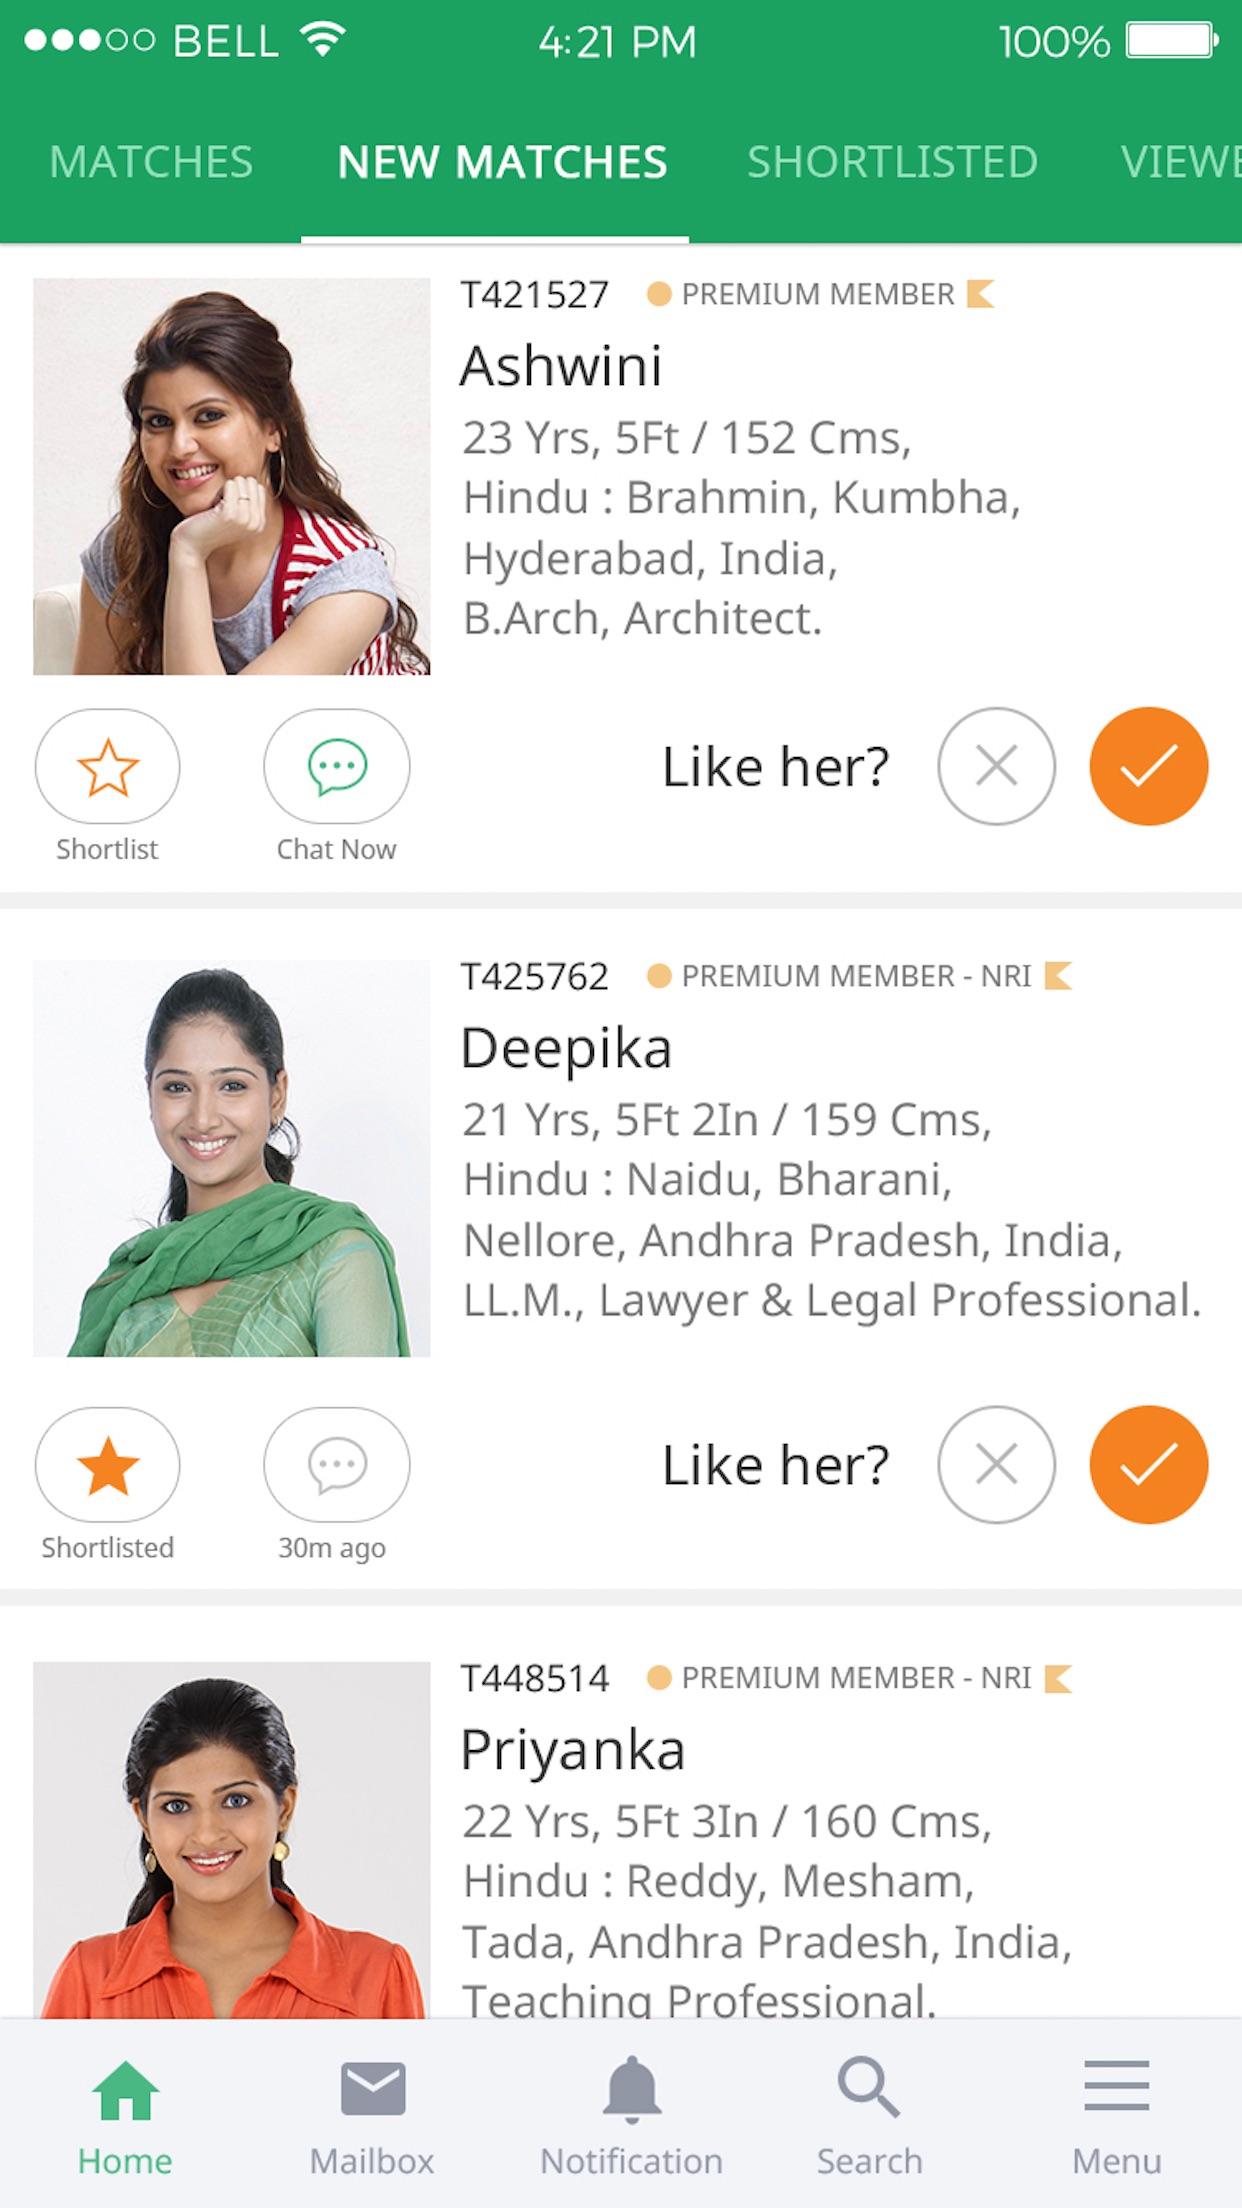 TeluguMatrimony - Matrimonial Screenshot